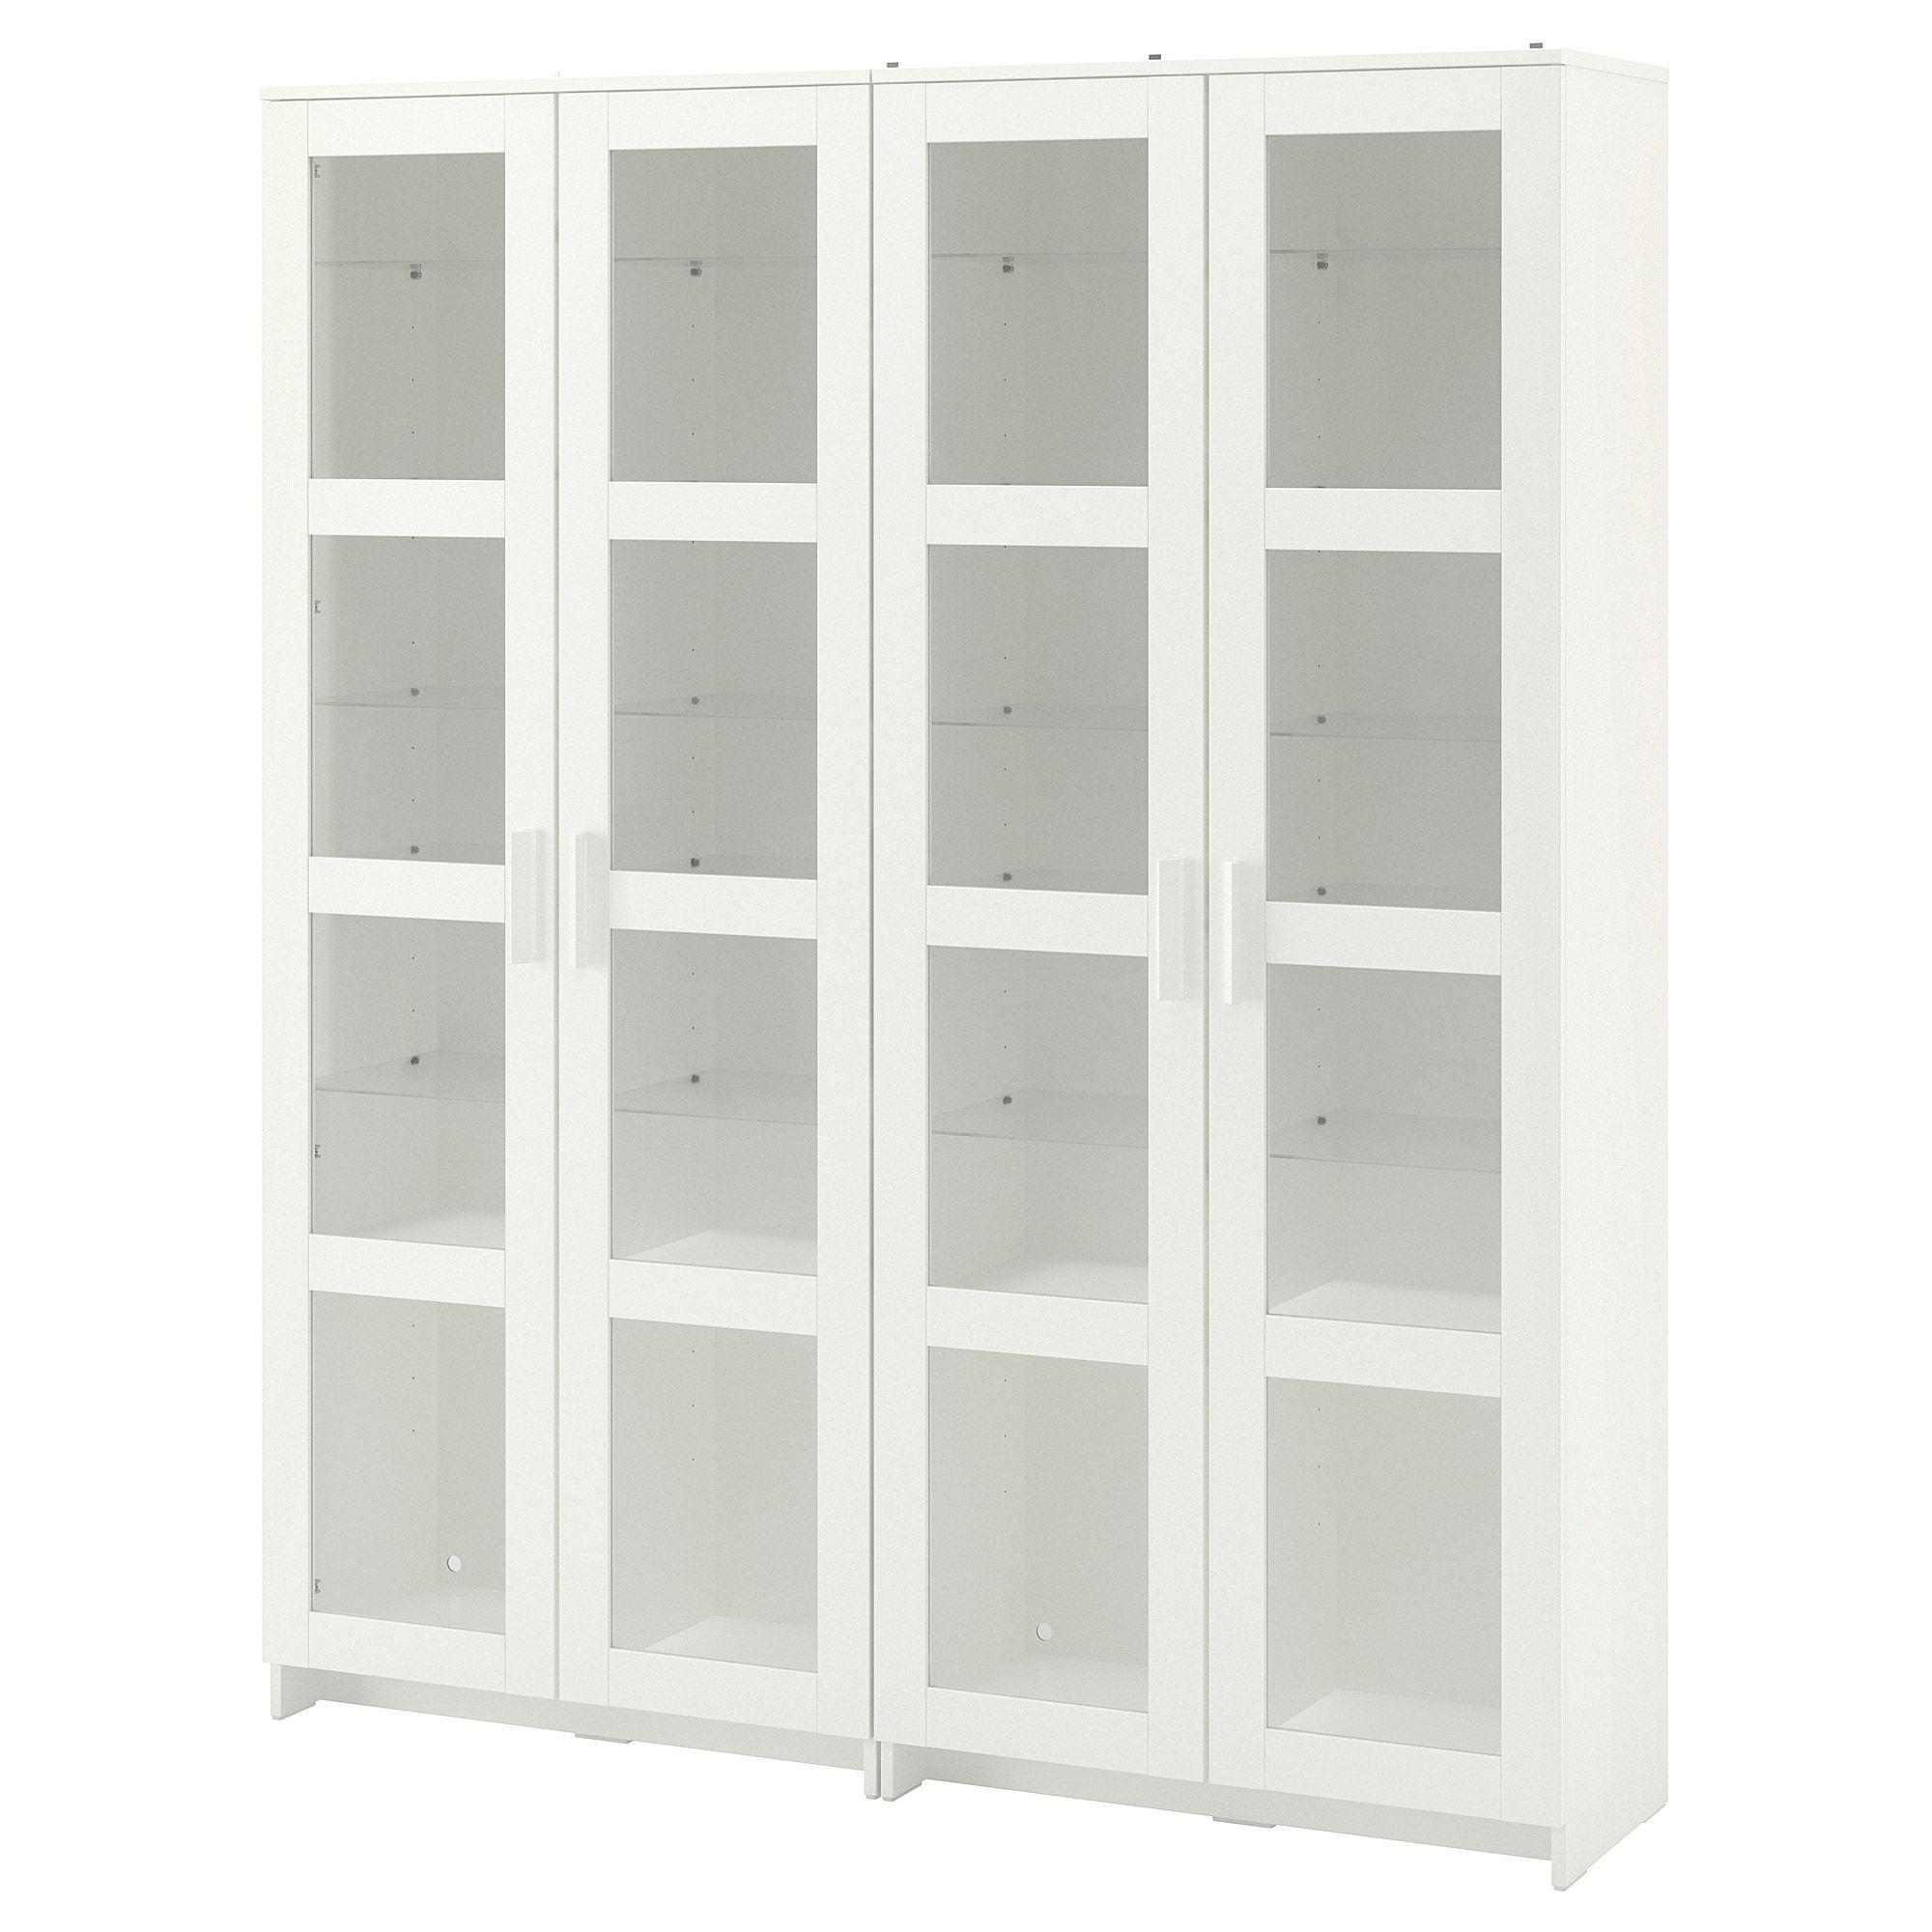 Ikea Brimnes White Storage Combination W Glass Doors In 2020